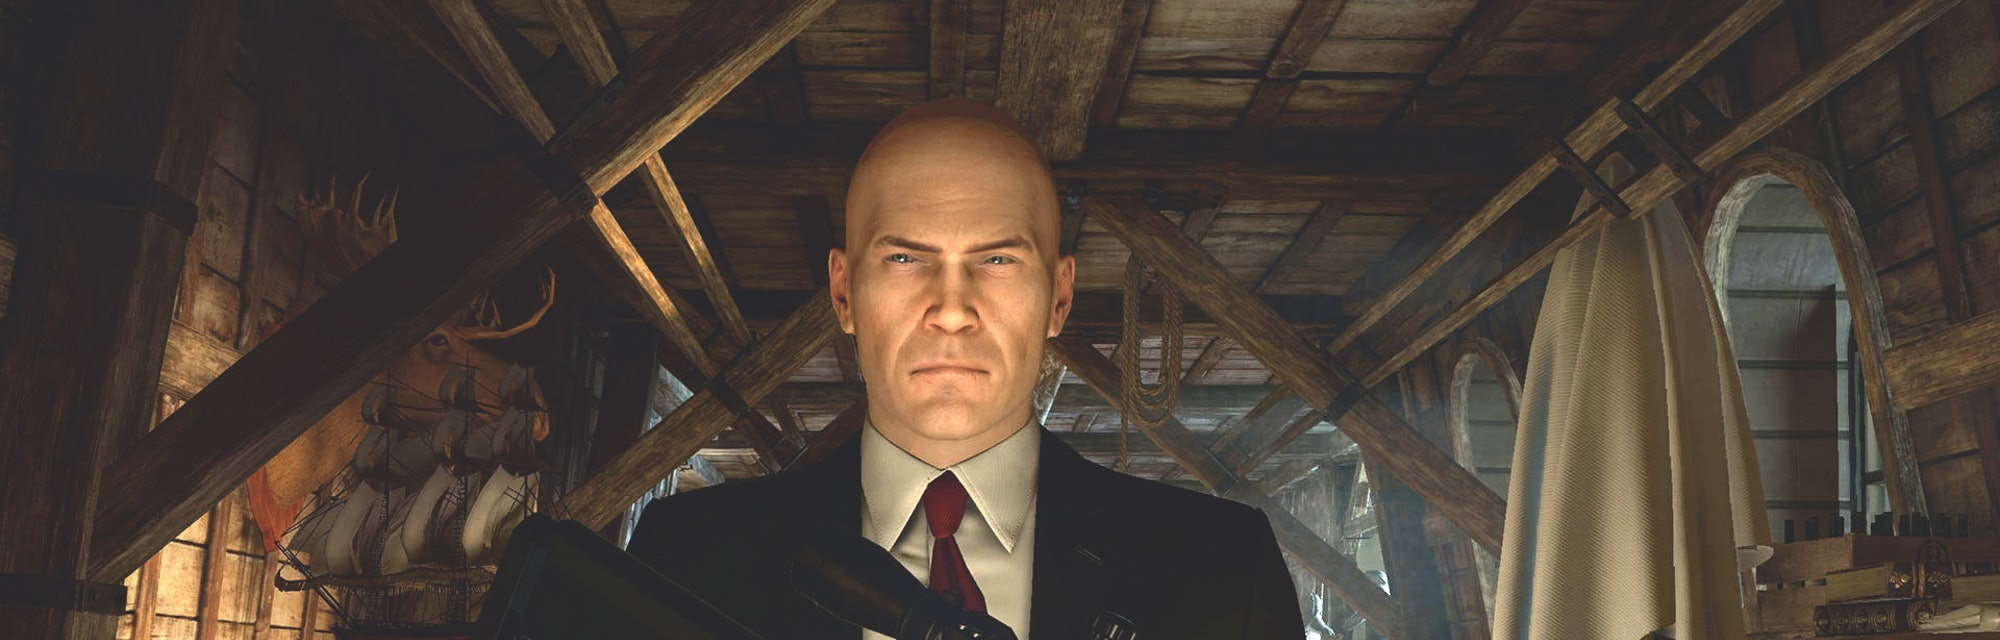 hitman 3 agent